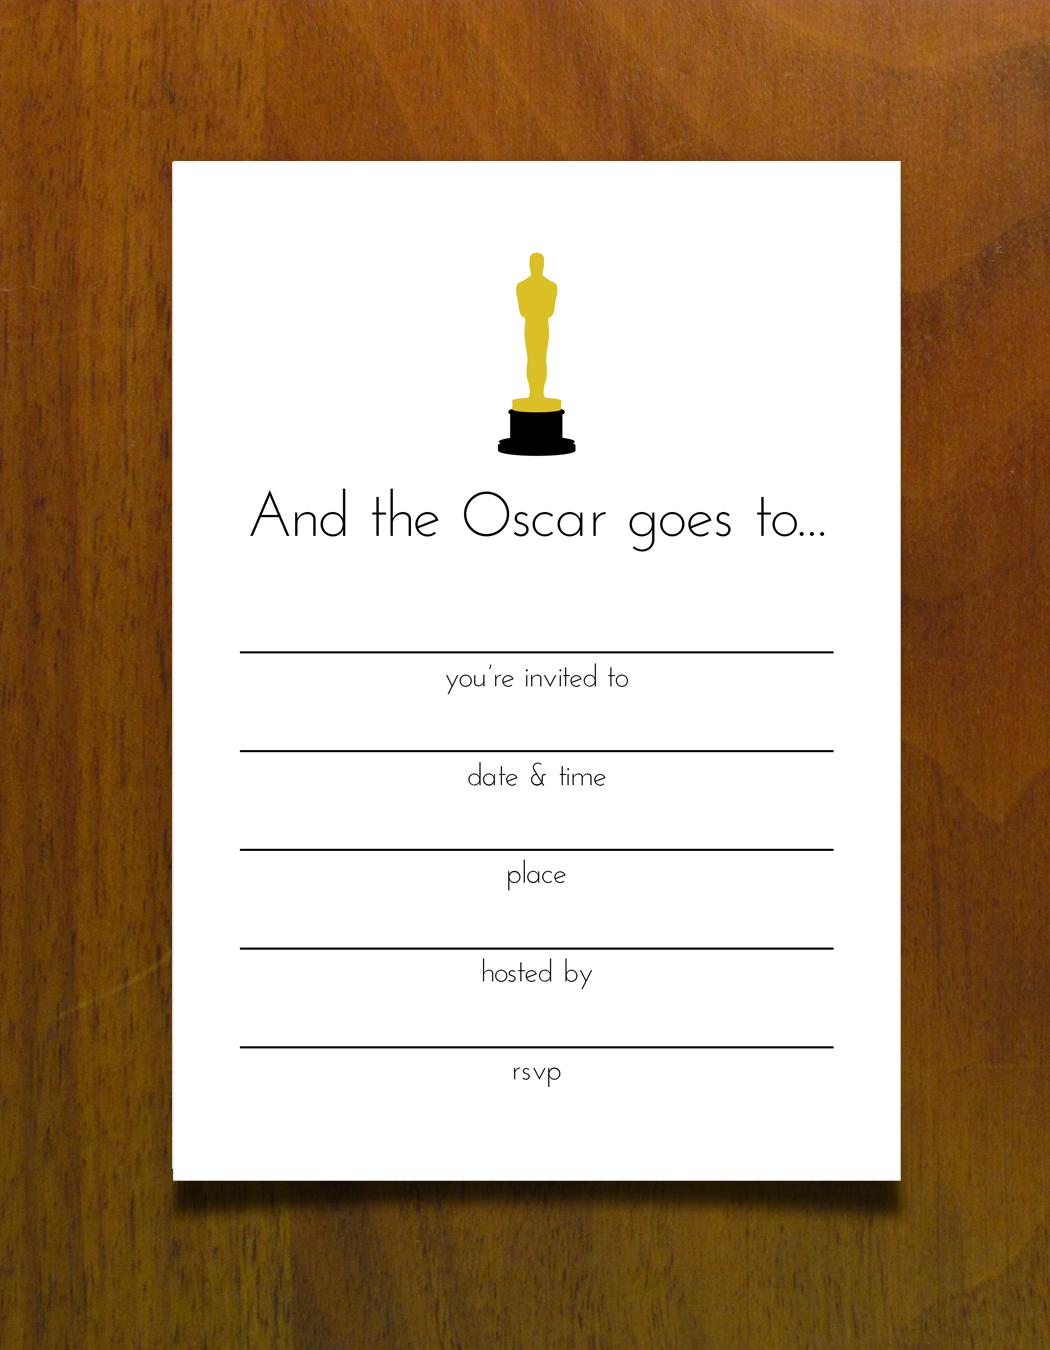 Office Oscar Ballot Fun 2012 likewise Oscar Party Sponsored Diet Coke besides Voting Clip Art moreover 86th Academy Awards Ballot also Paper Crown Cut Out. on oscar ballot printed